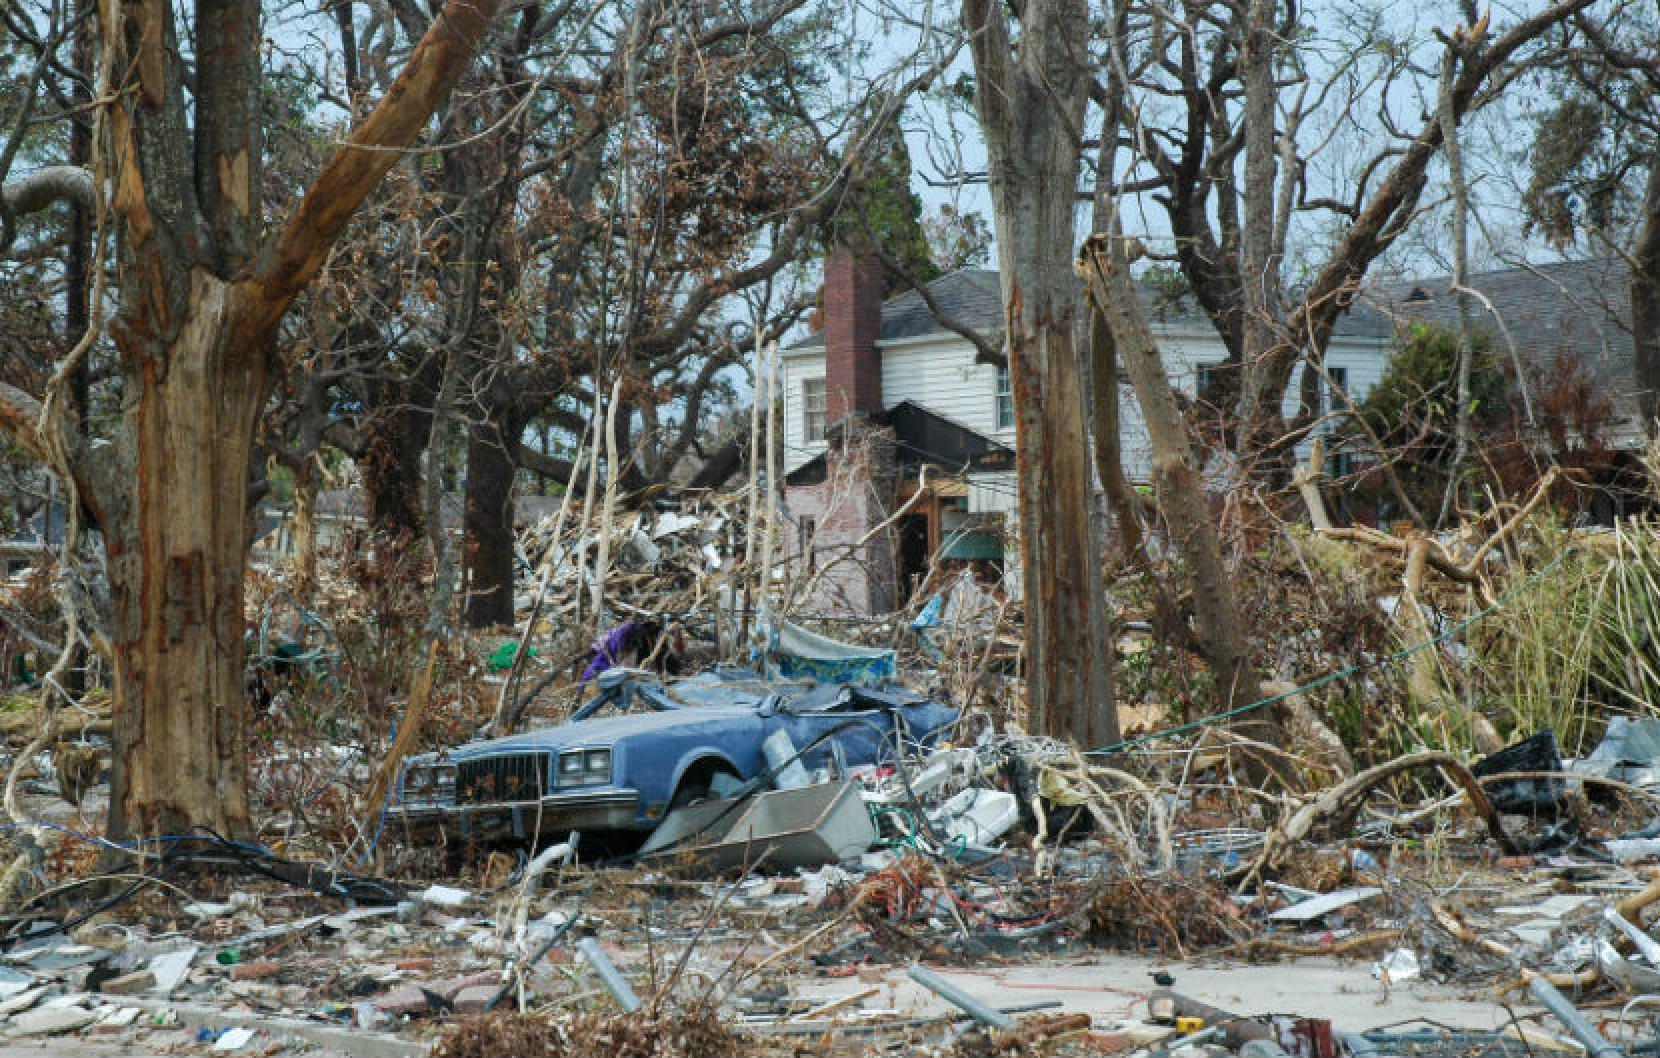 hurricane katrina damage deaths aftermath amp facts - HD1280×800